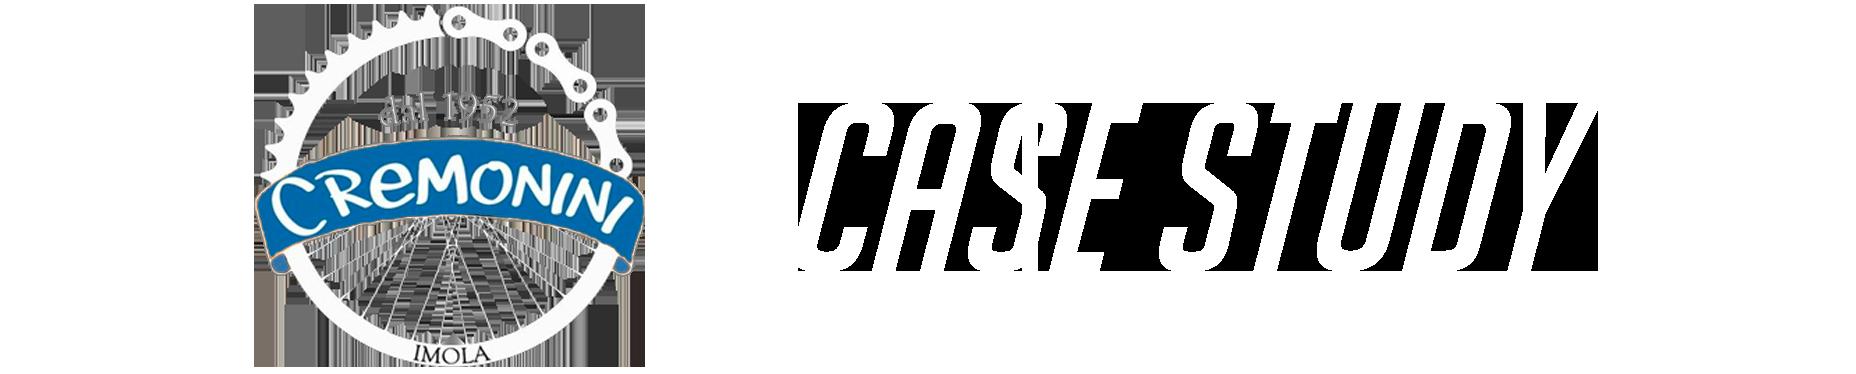 SC-Case-Study-Logo-Cremonini